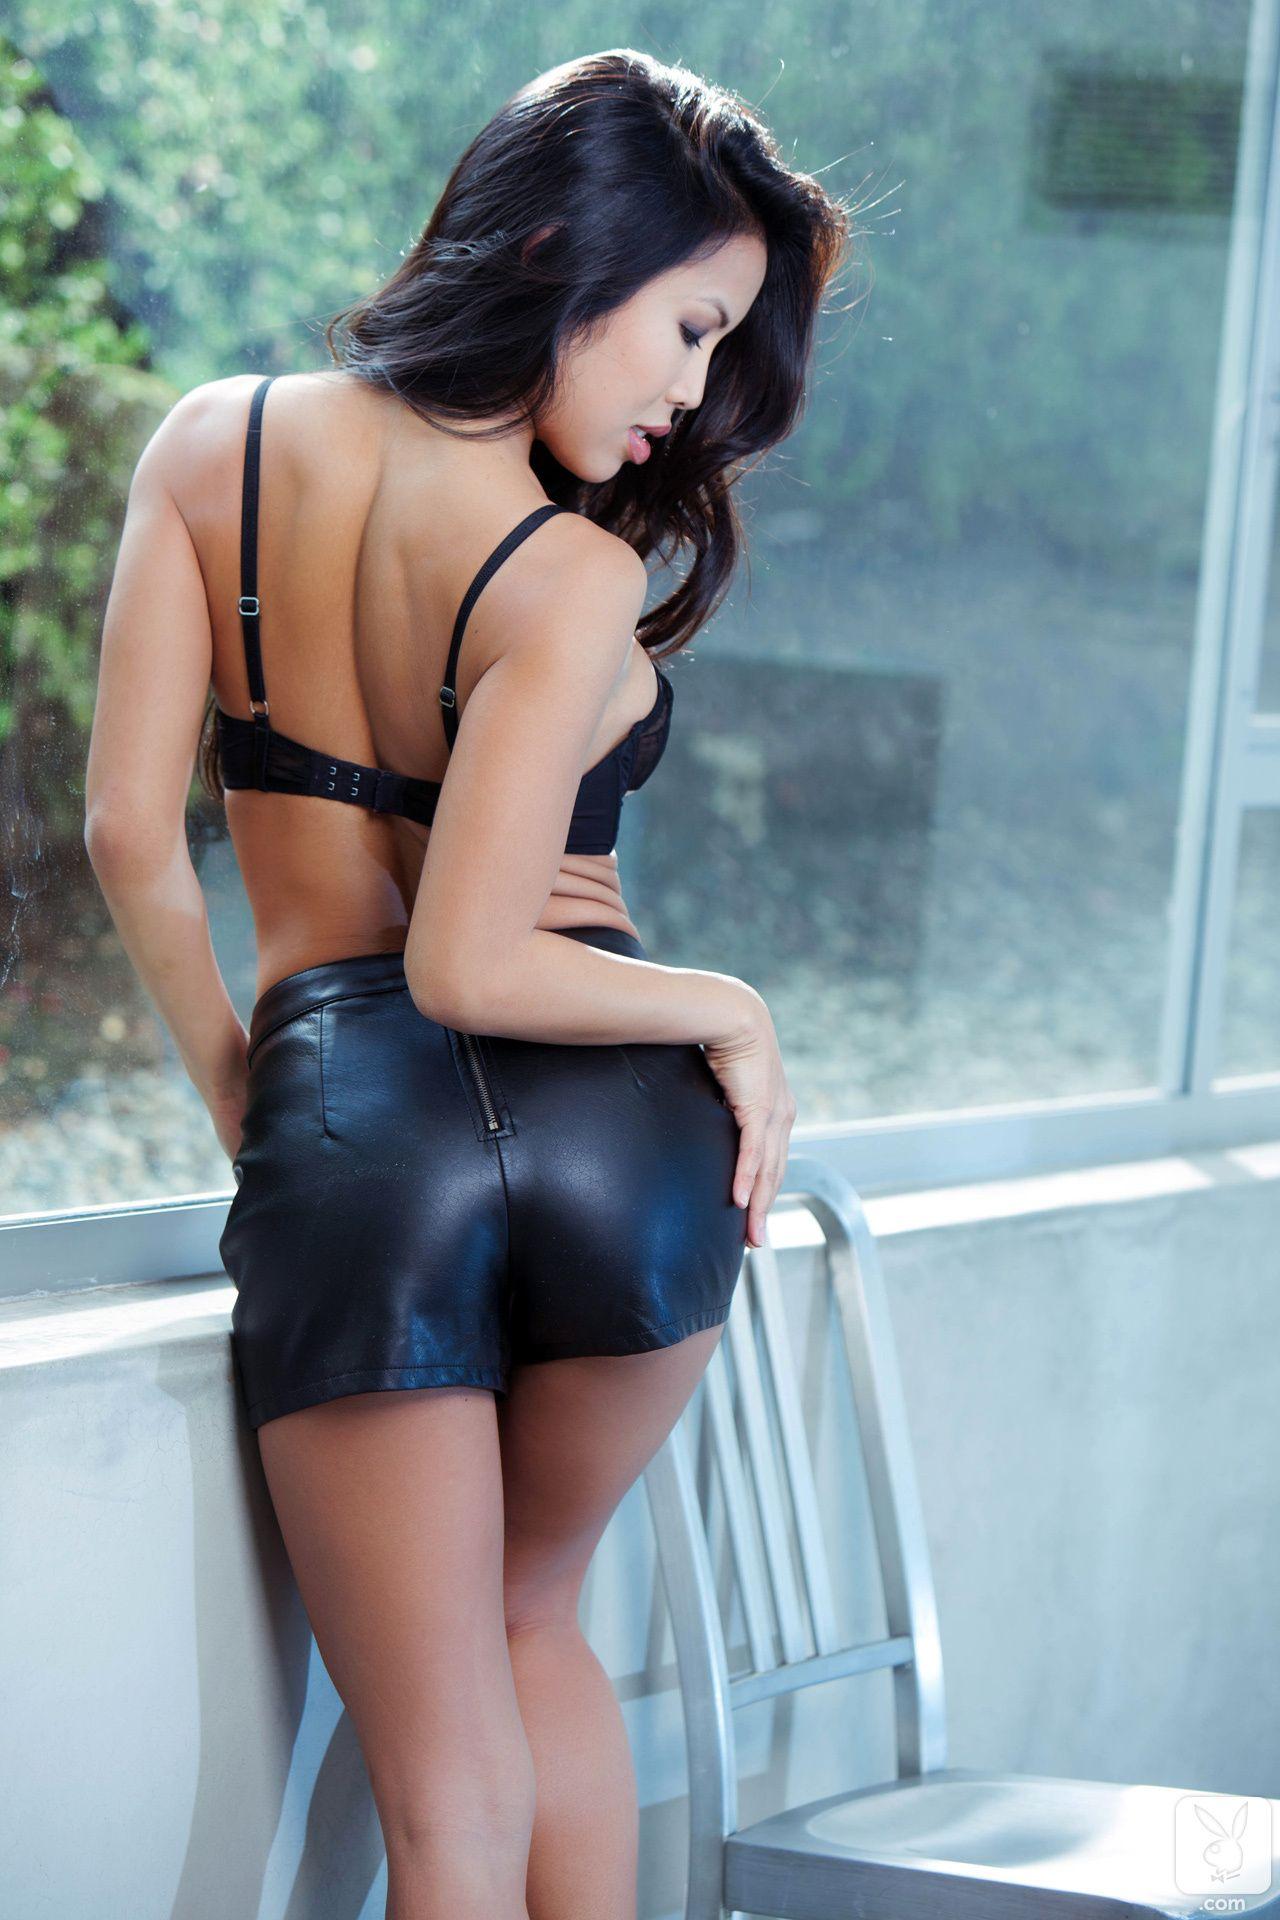 Asian playboy girl